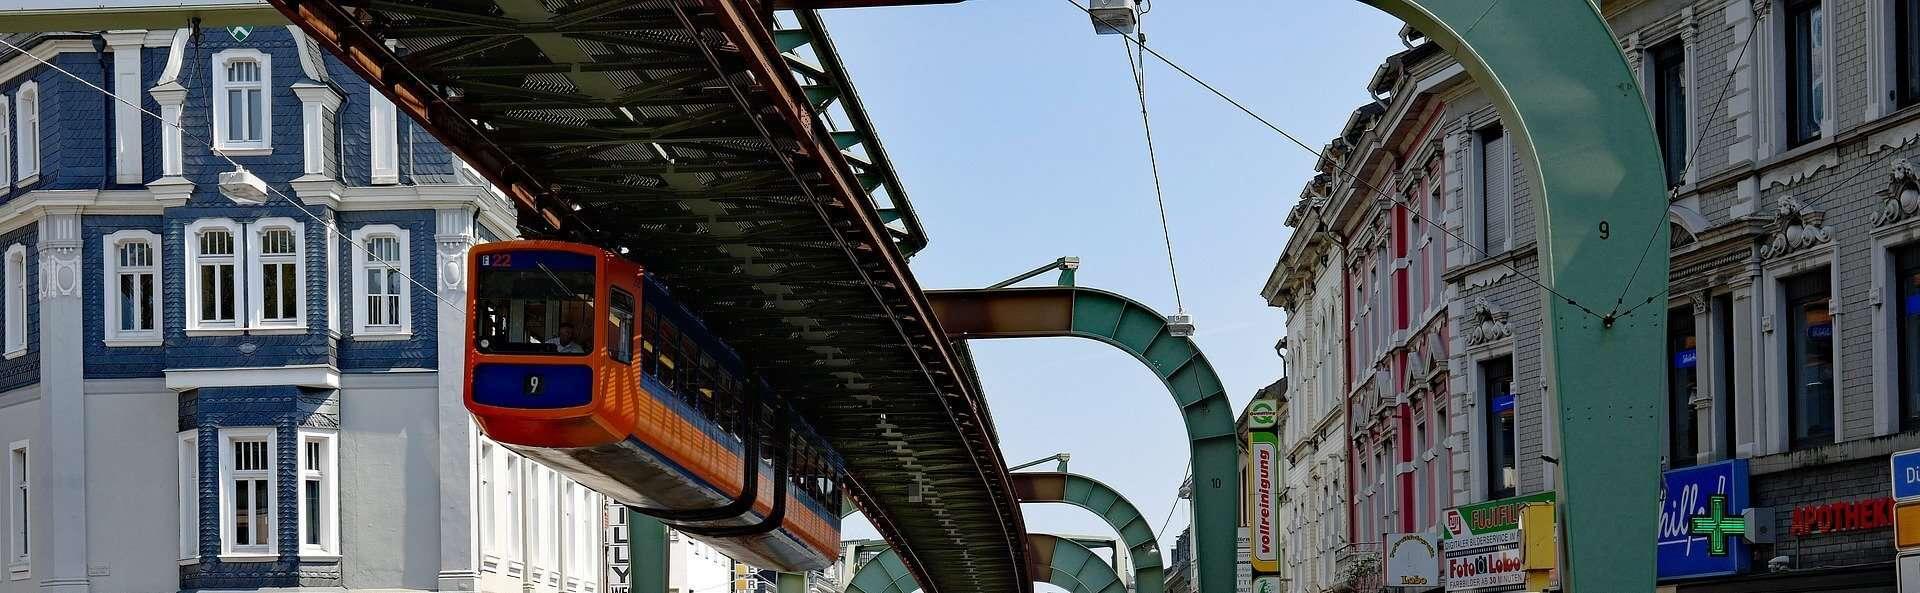 Unabhängige Finanzberatung Wuppertal